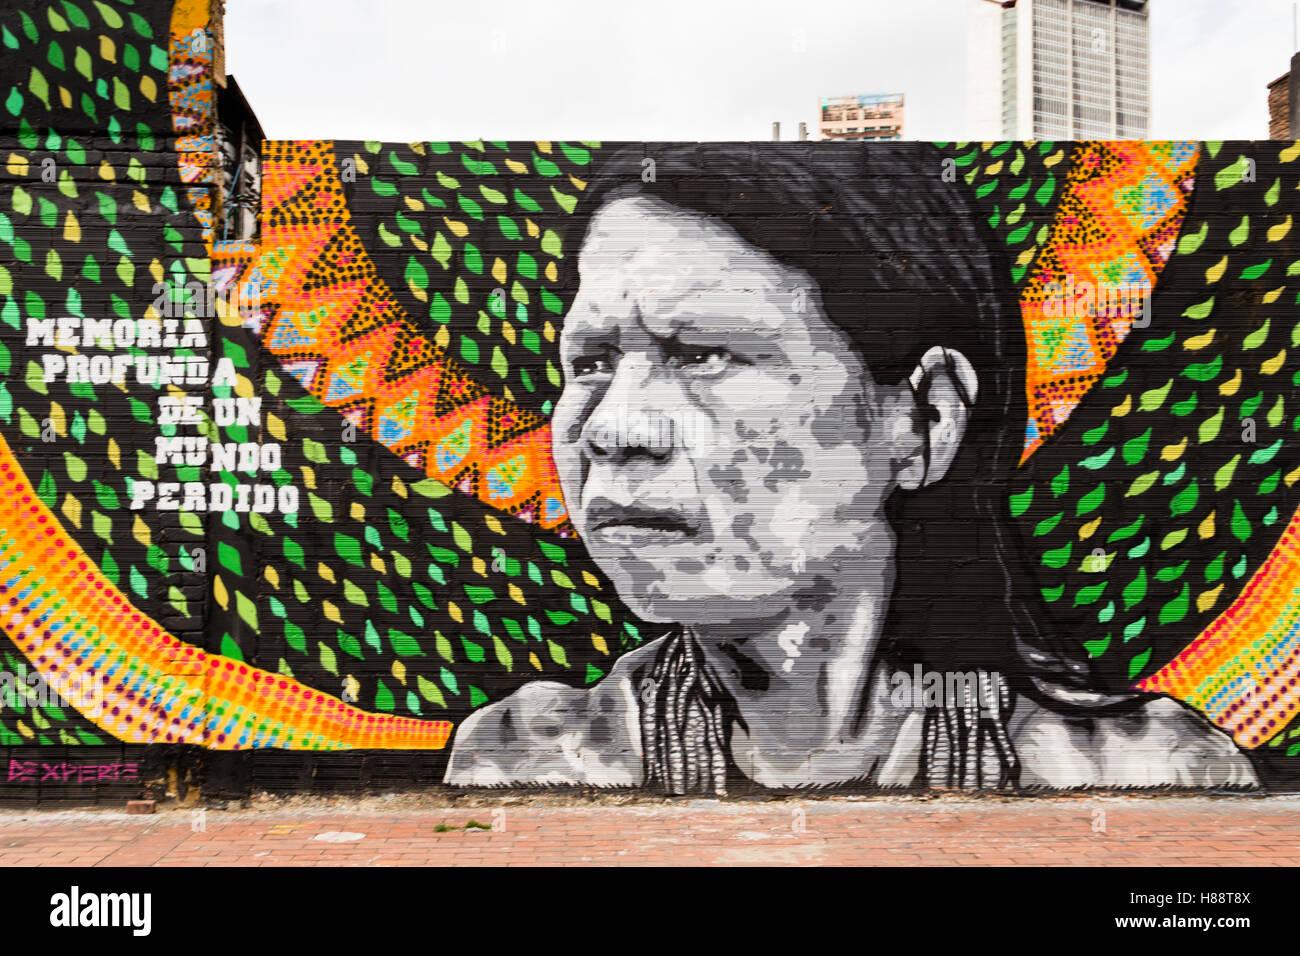 Street art, peinture murale, Bogota, District de Santafe, Colombie Photo Stock